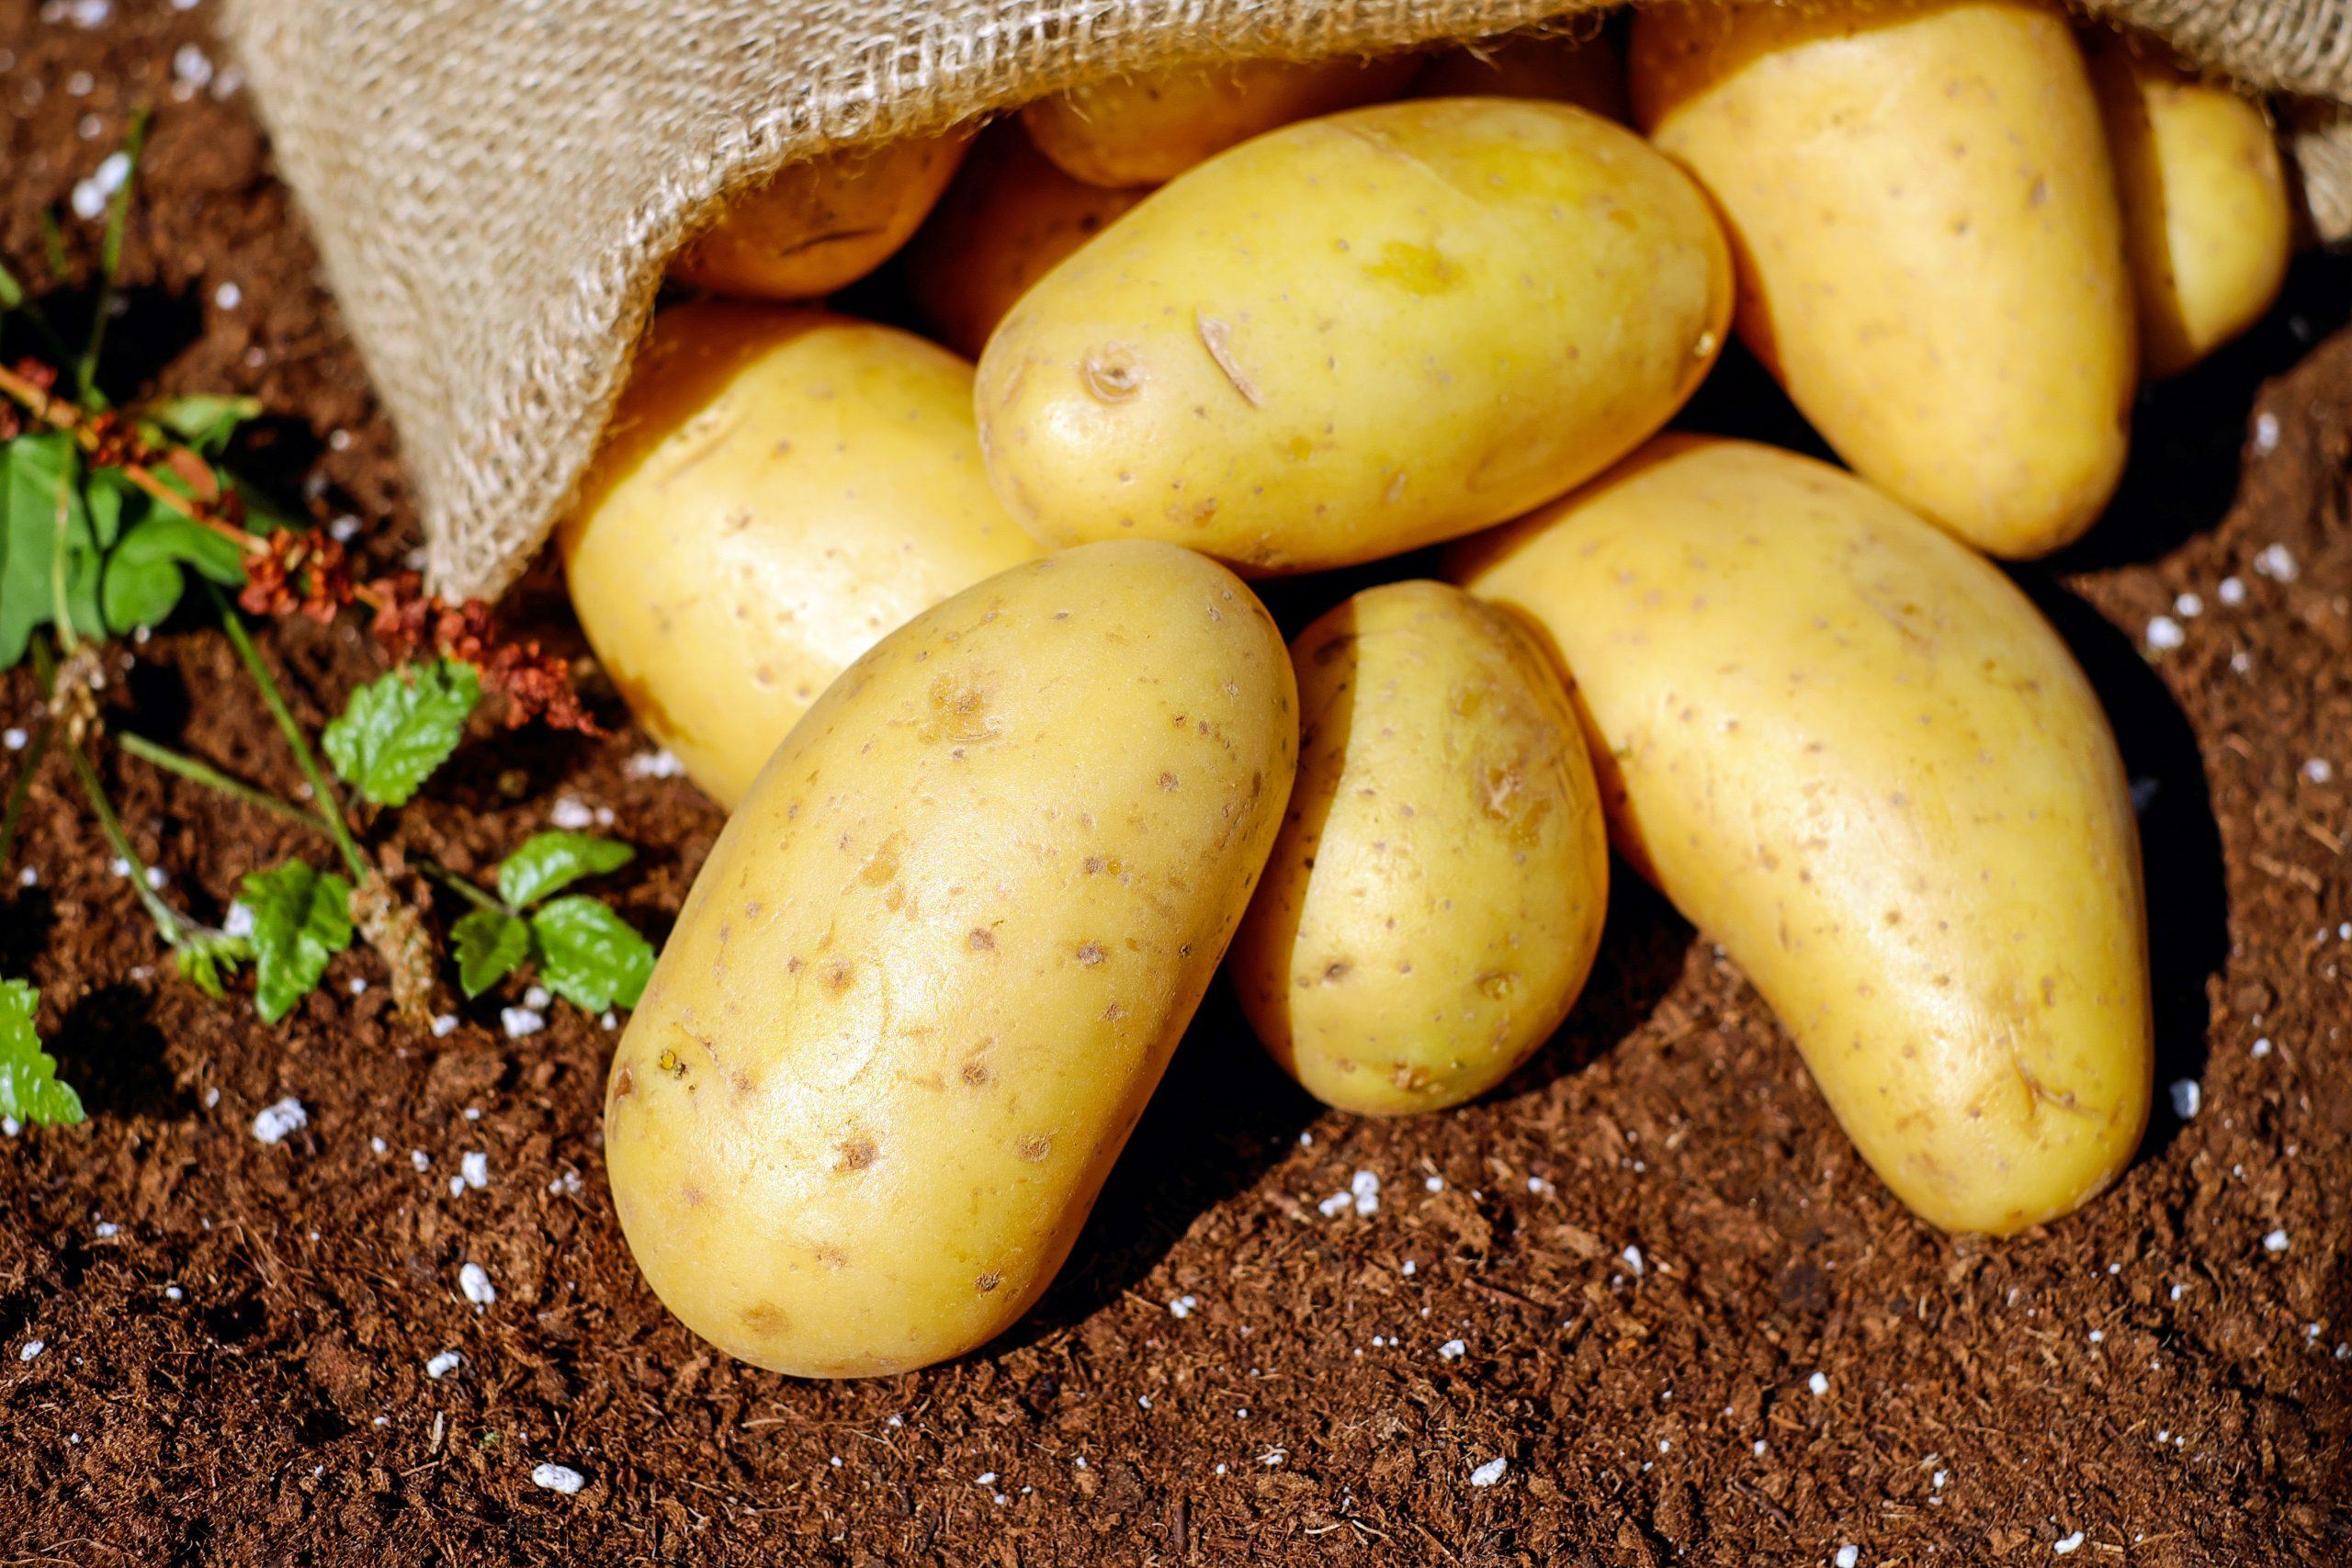 20 Foods Harmful to Dogs - raw potato